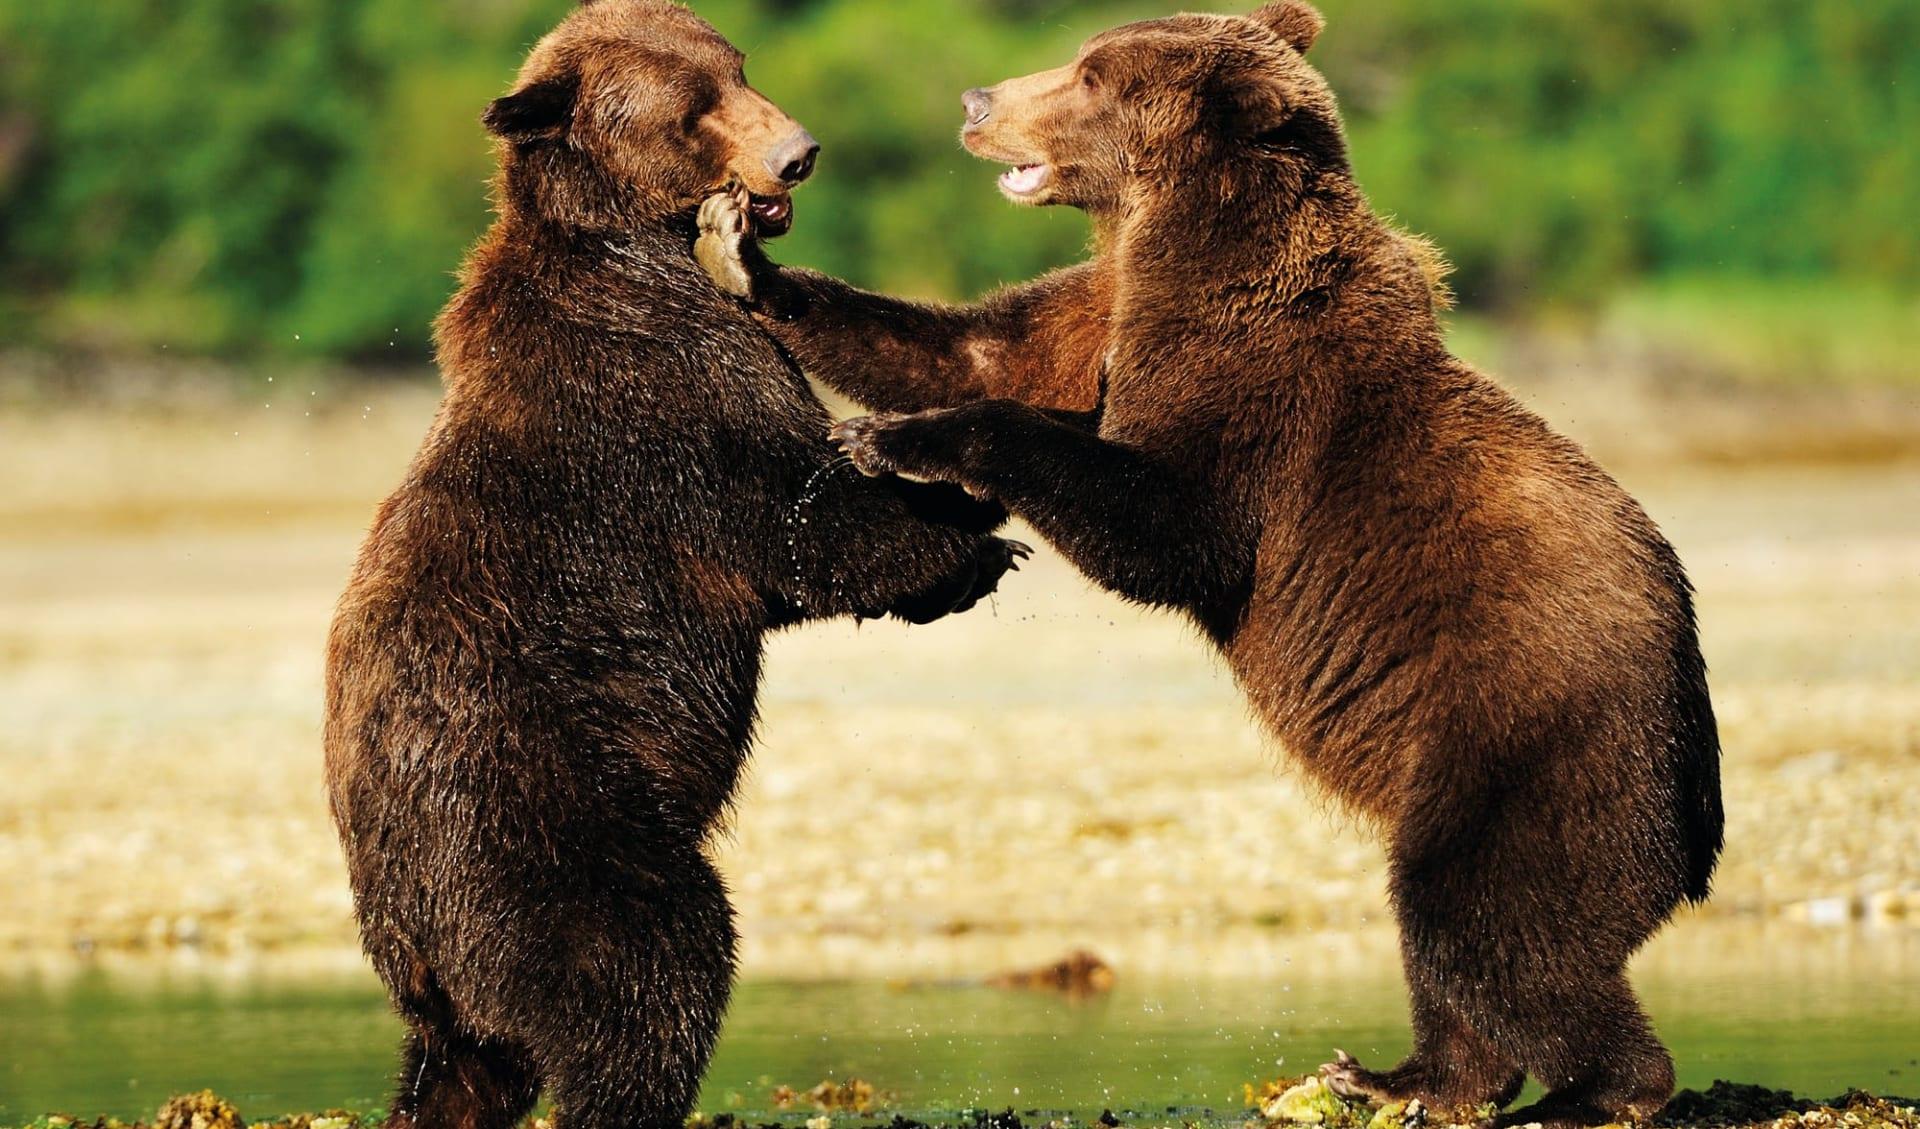 Bärenbeobachtung Redoubt Bay Lodge 3 Tage ab Anchorage: Alaska - Katmai Nationalpark - Bären am Spielen